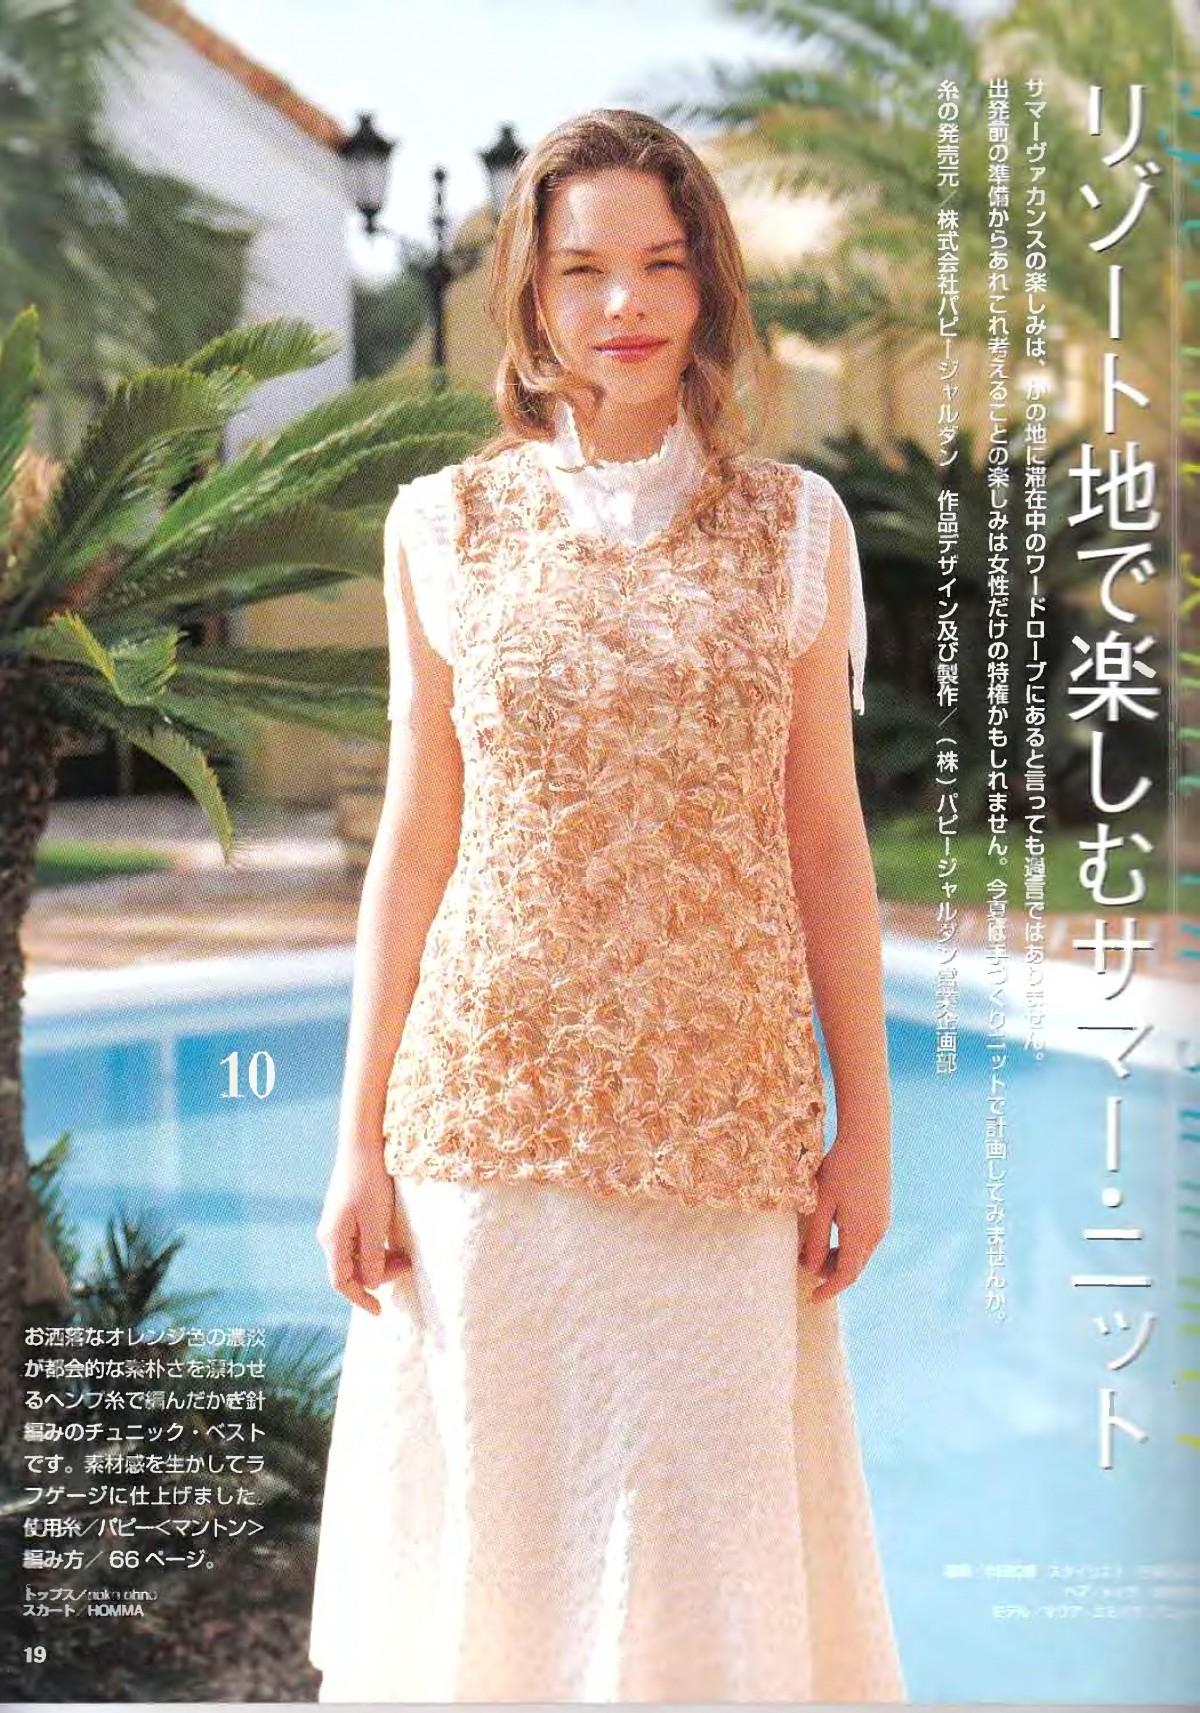 Lets-knit-series-NV4359-2008-Spring-Summer-sp-kr_17.jpg